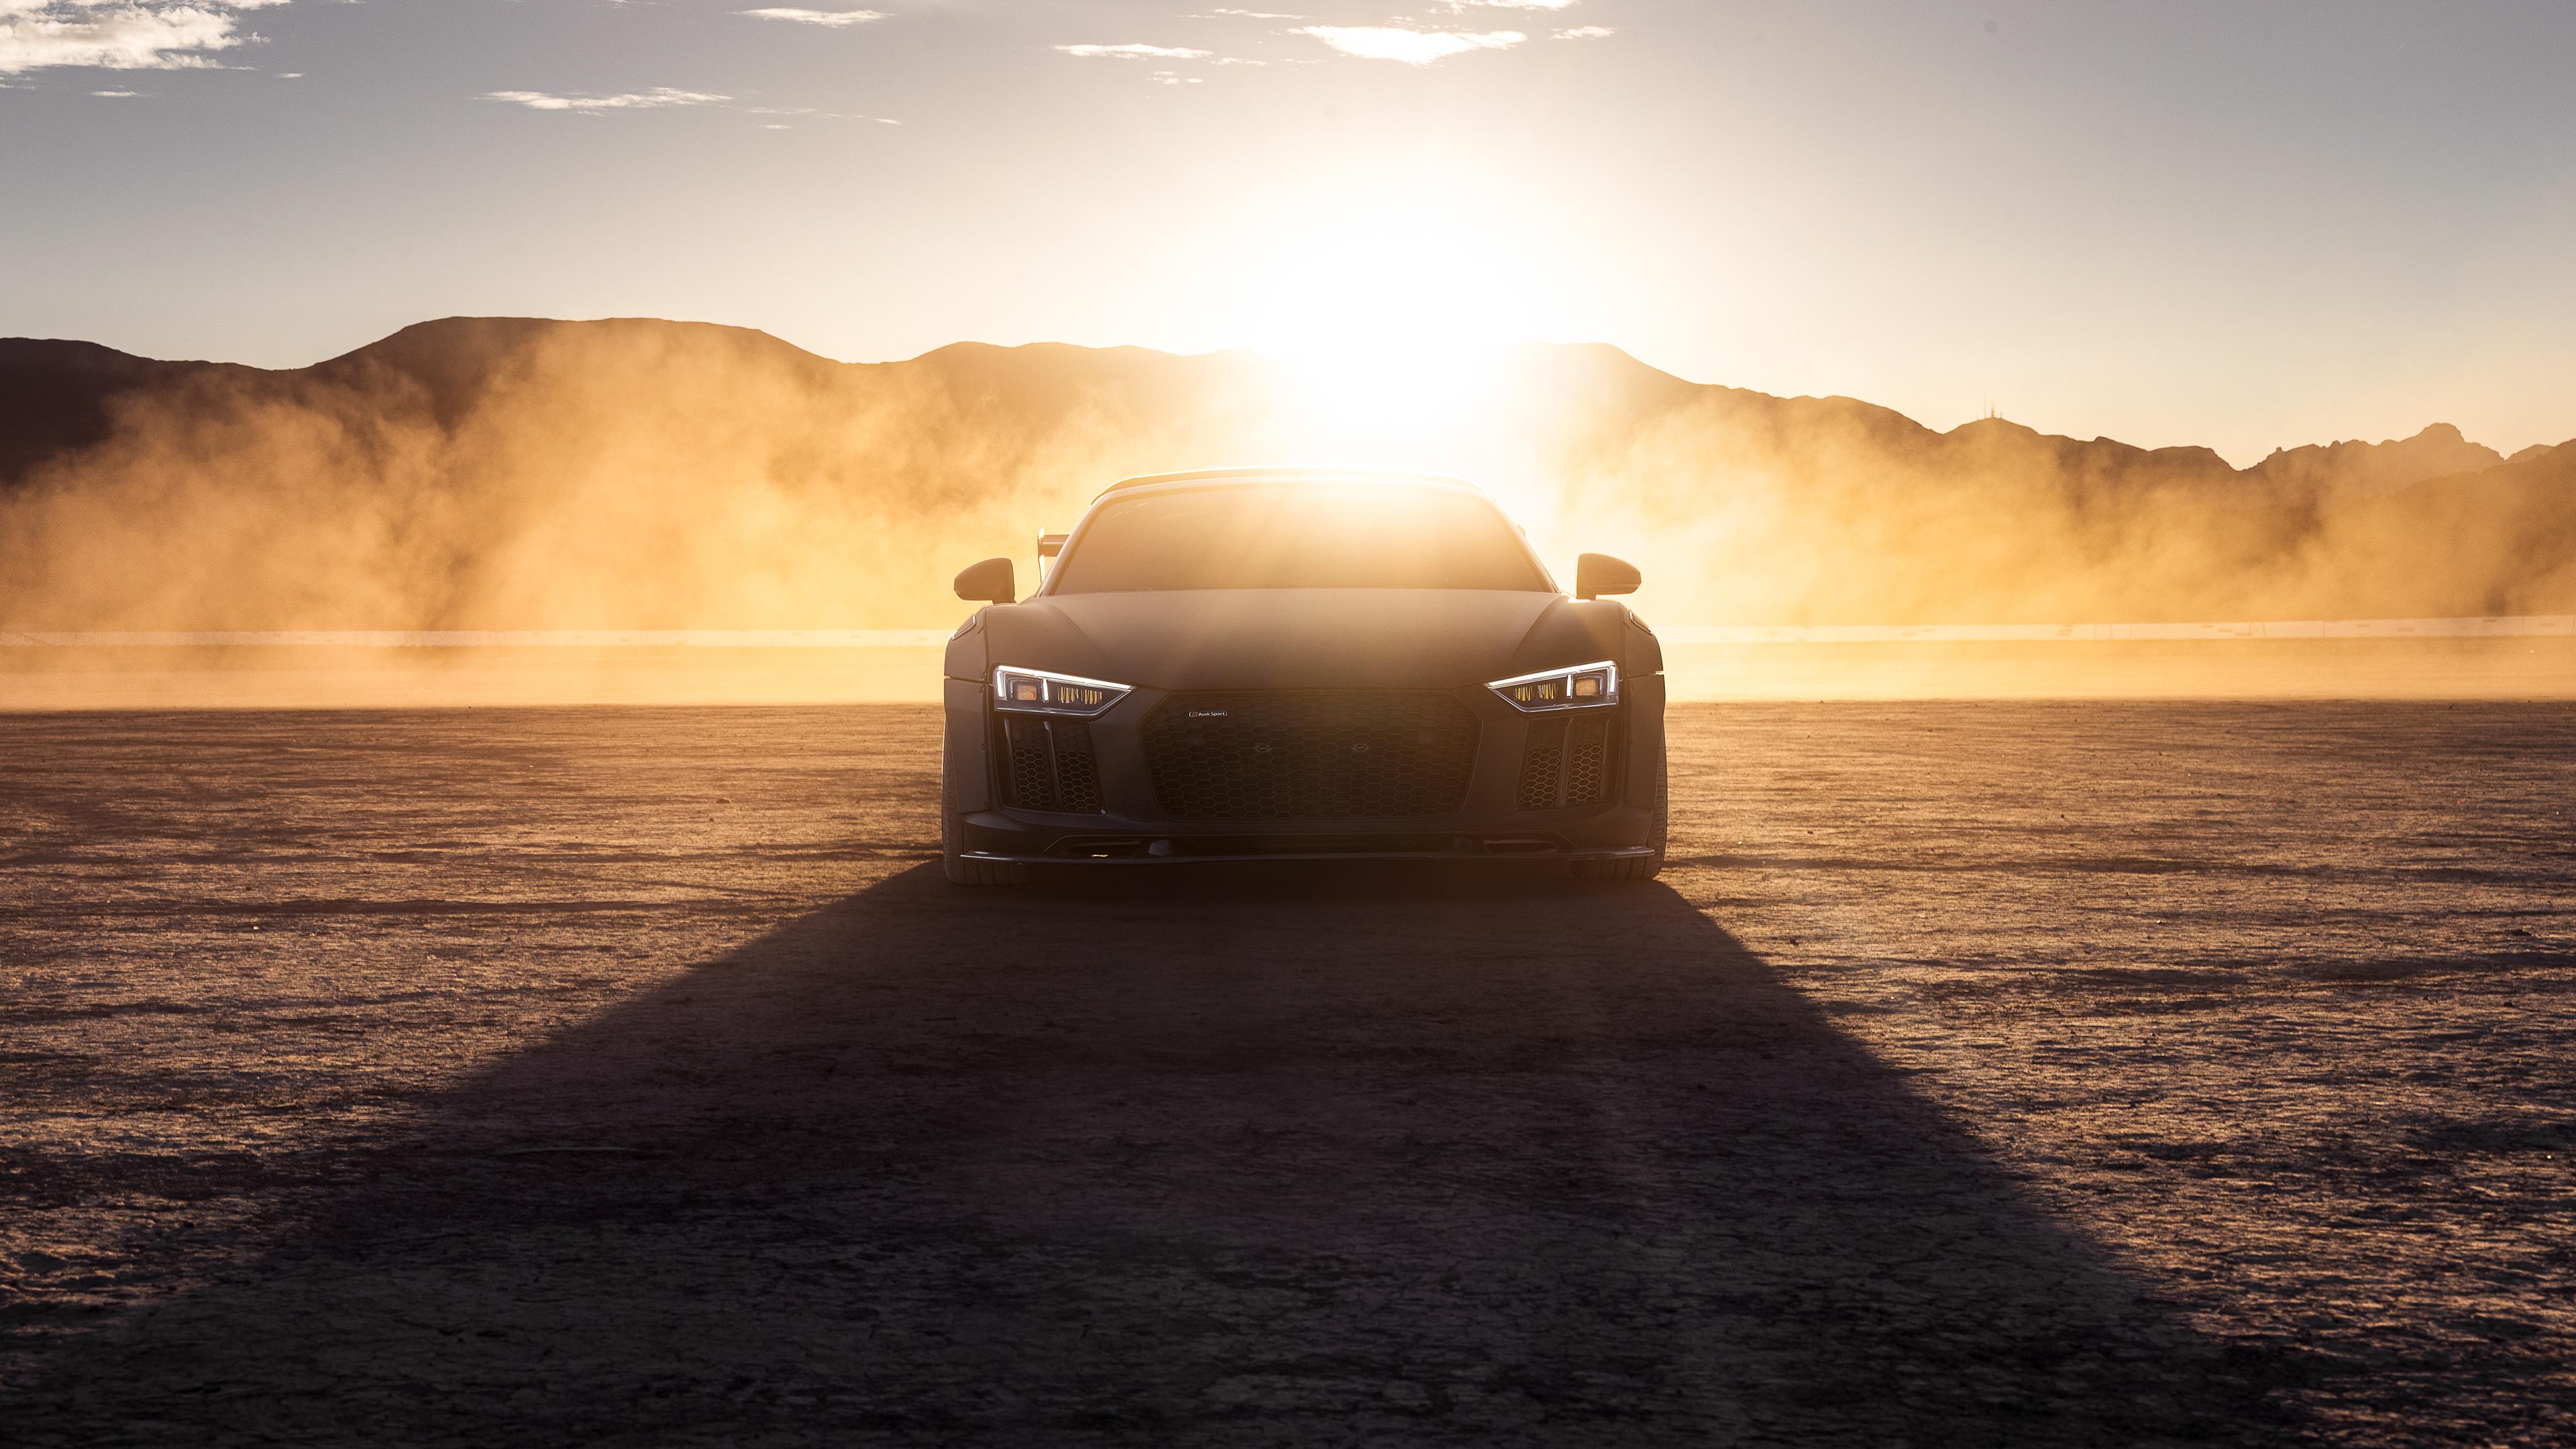 audi r8 dry lake desert 4k 1620167814 - Audi R8 Dry Lake Desert 4k - Audi R8 Dry Lake Desert 4k wallpapers